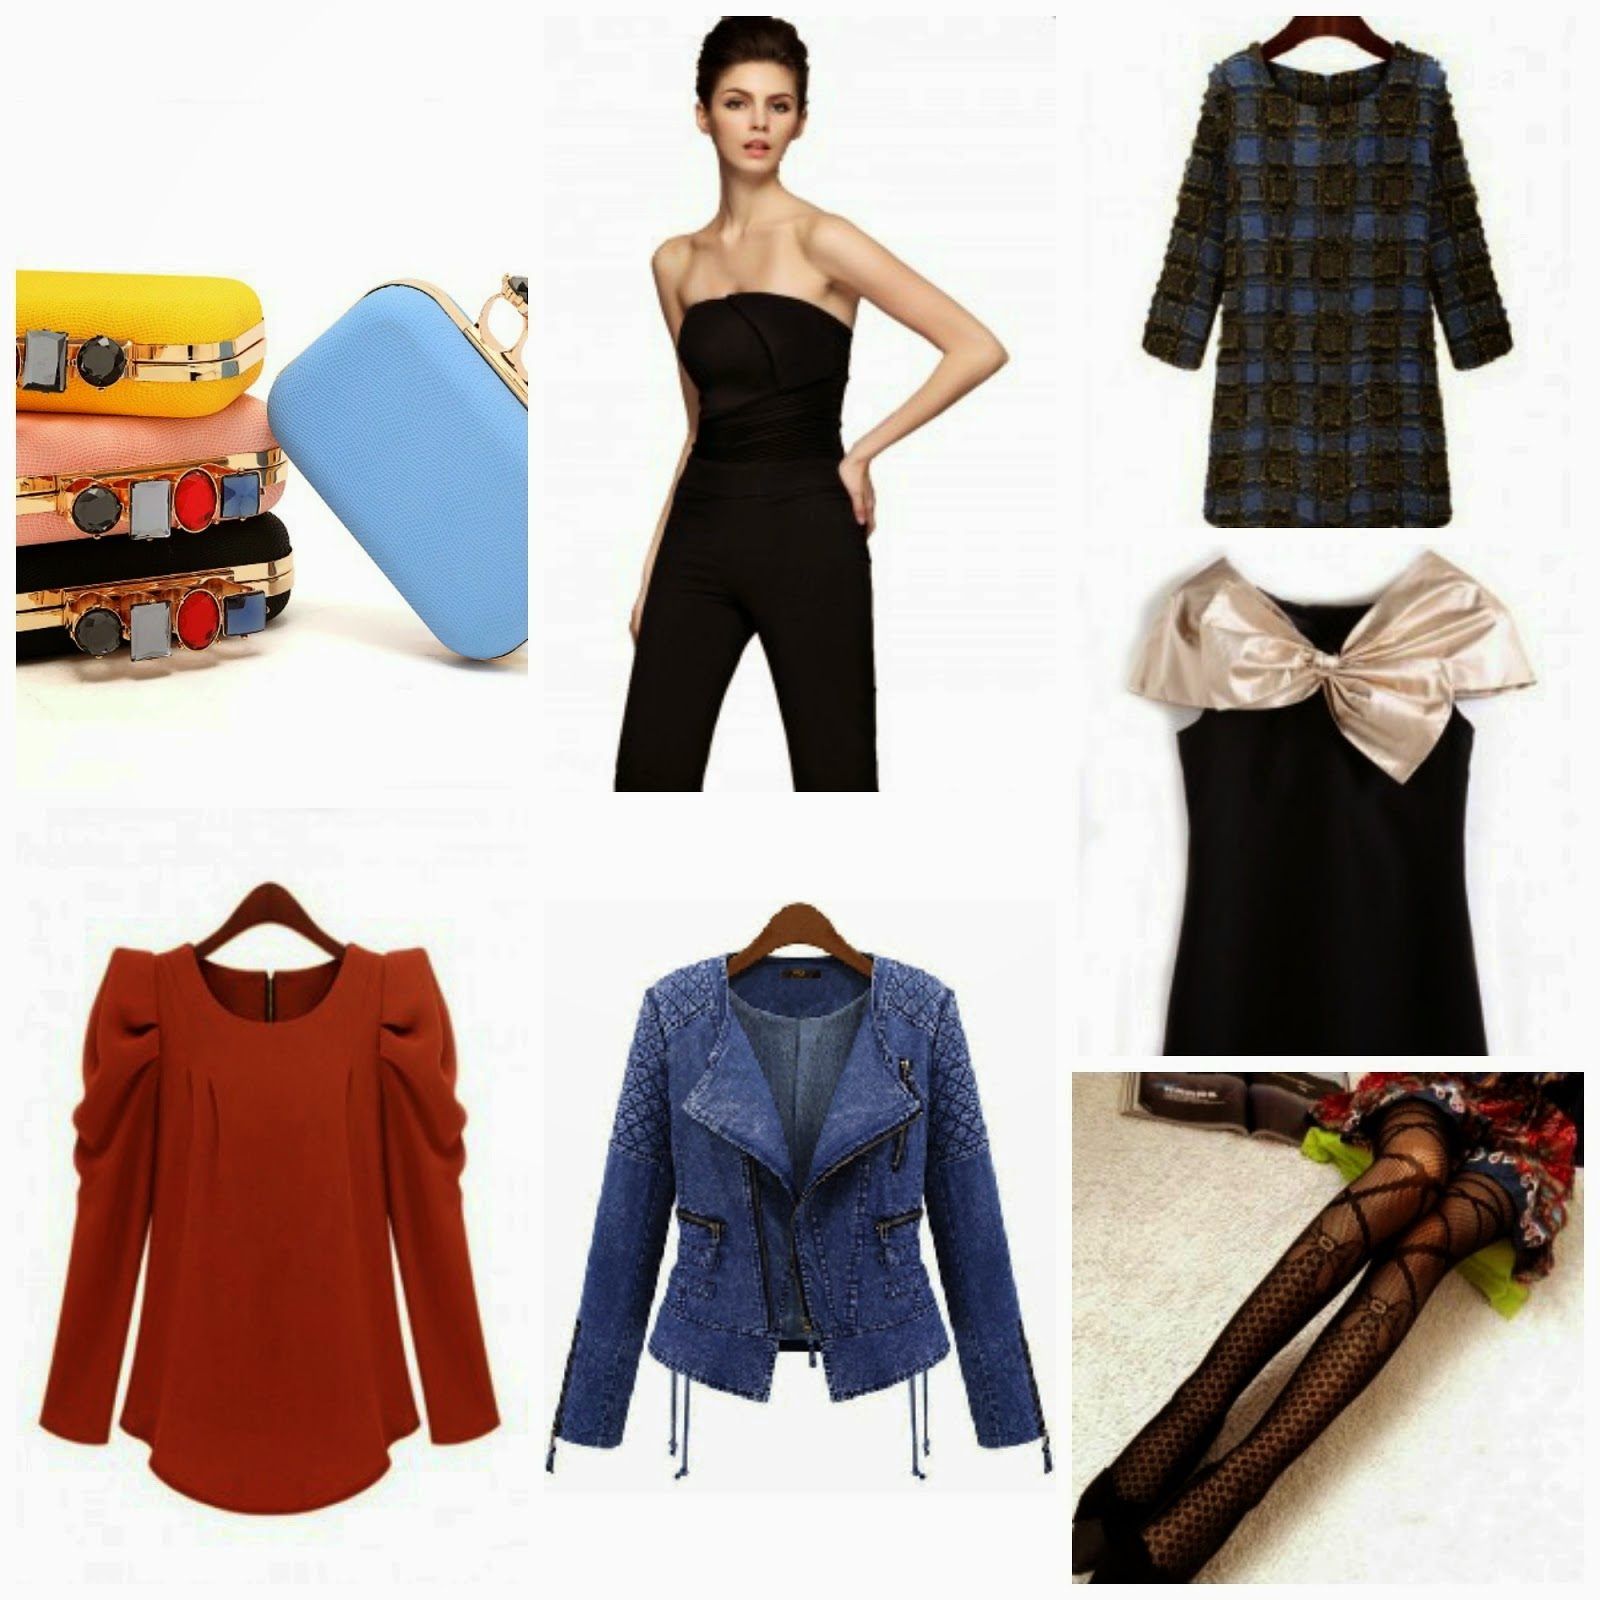 abbigliamento low cost beste shop review. Black Bedroom Furniture Sets. Home Design Ideas